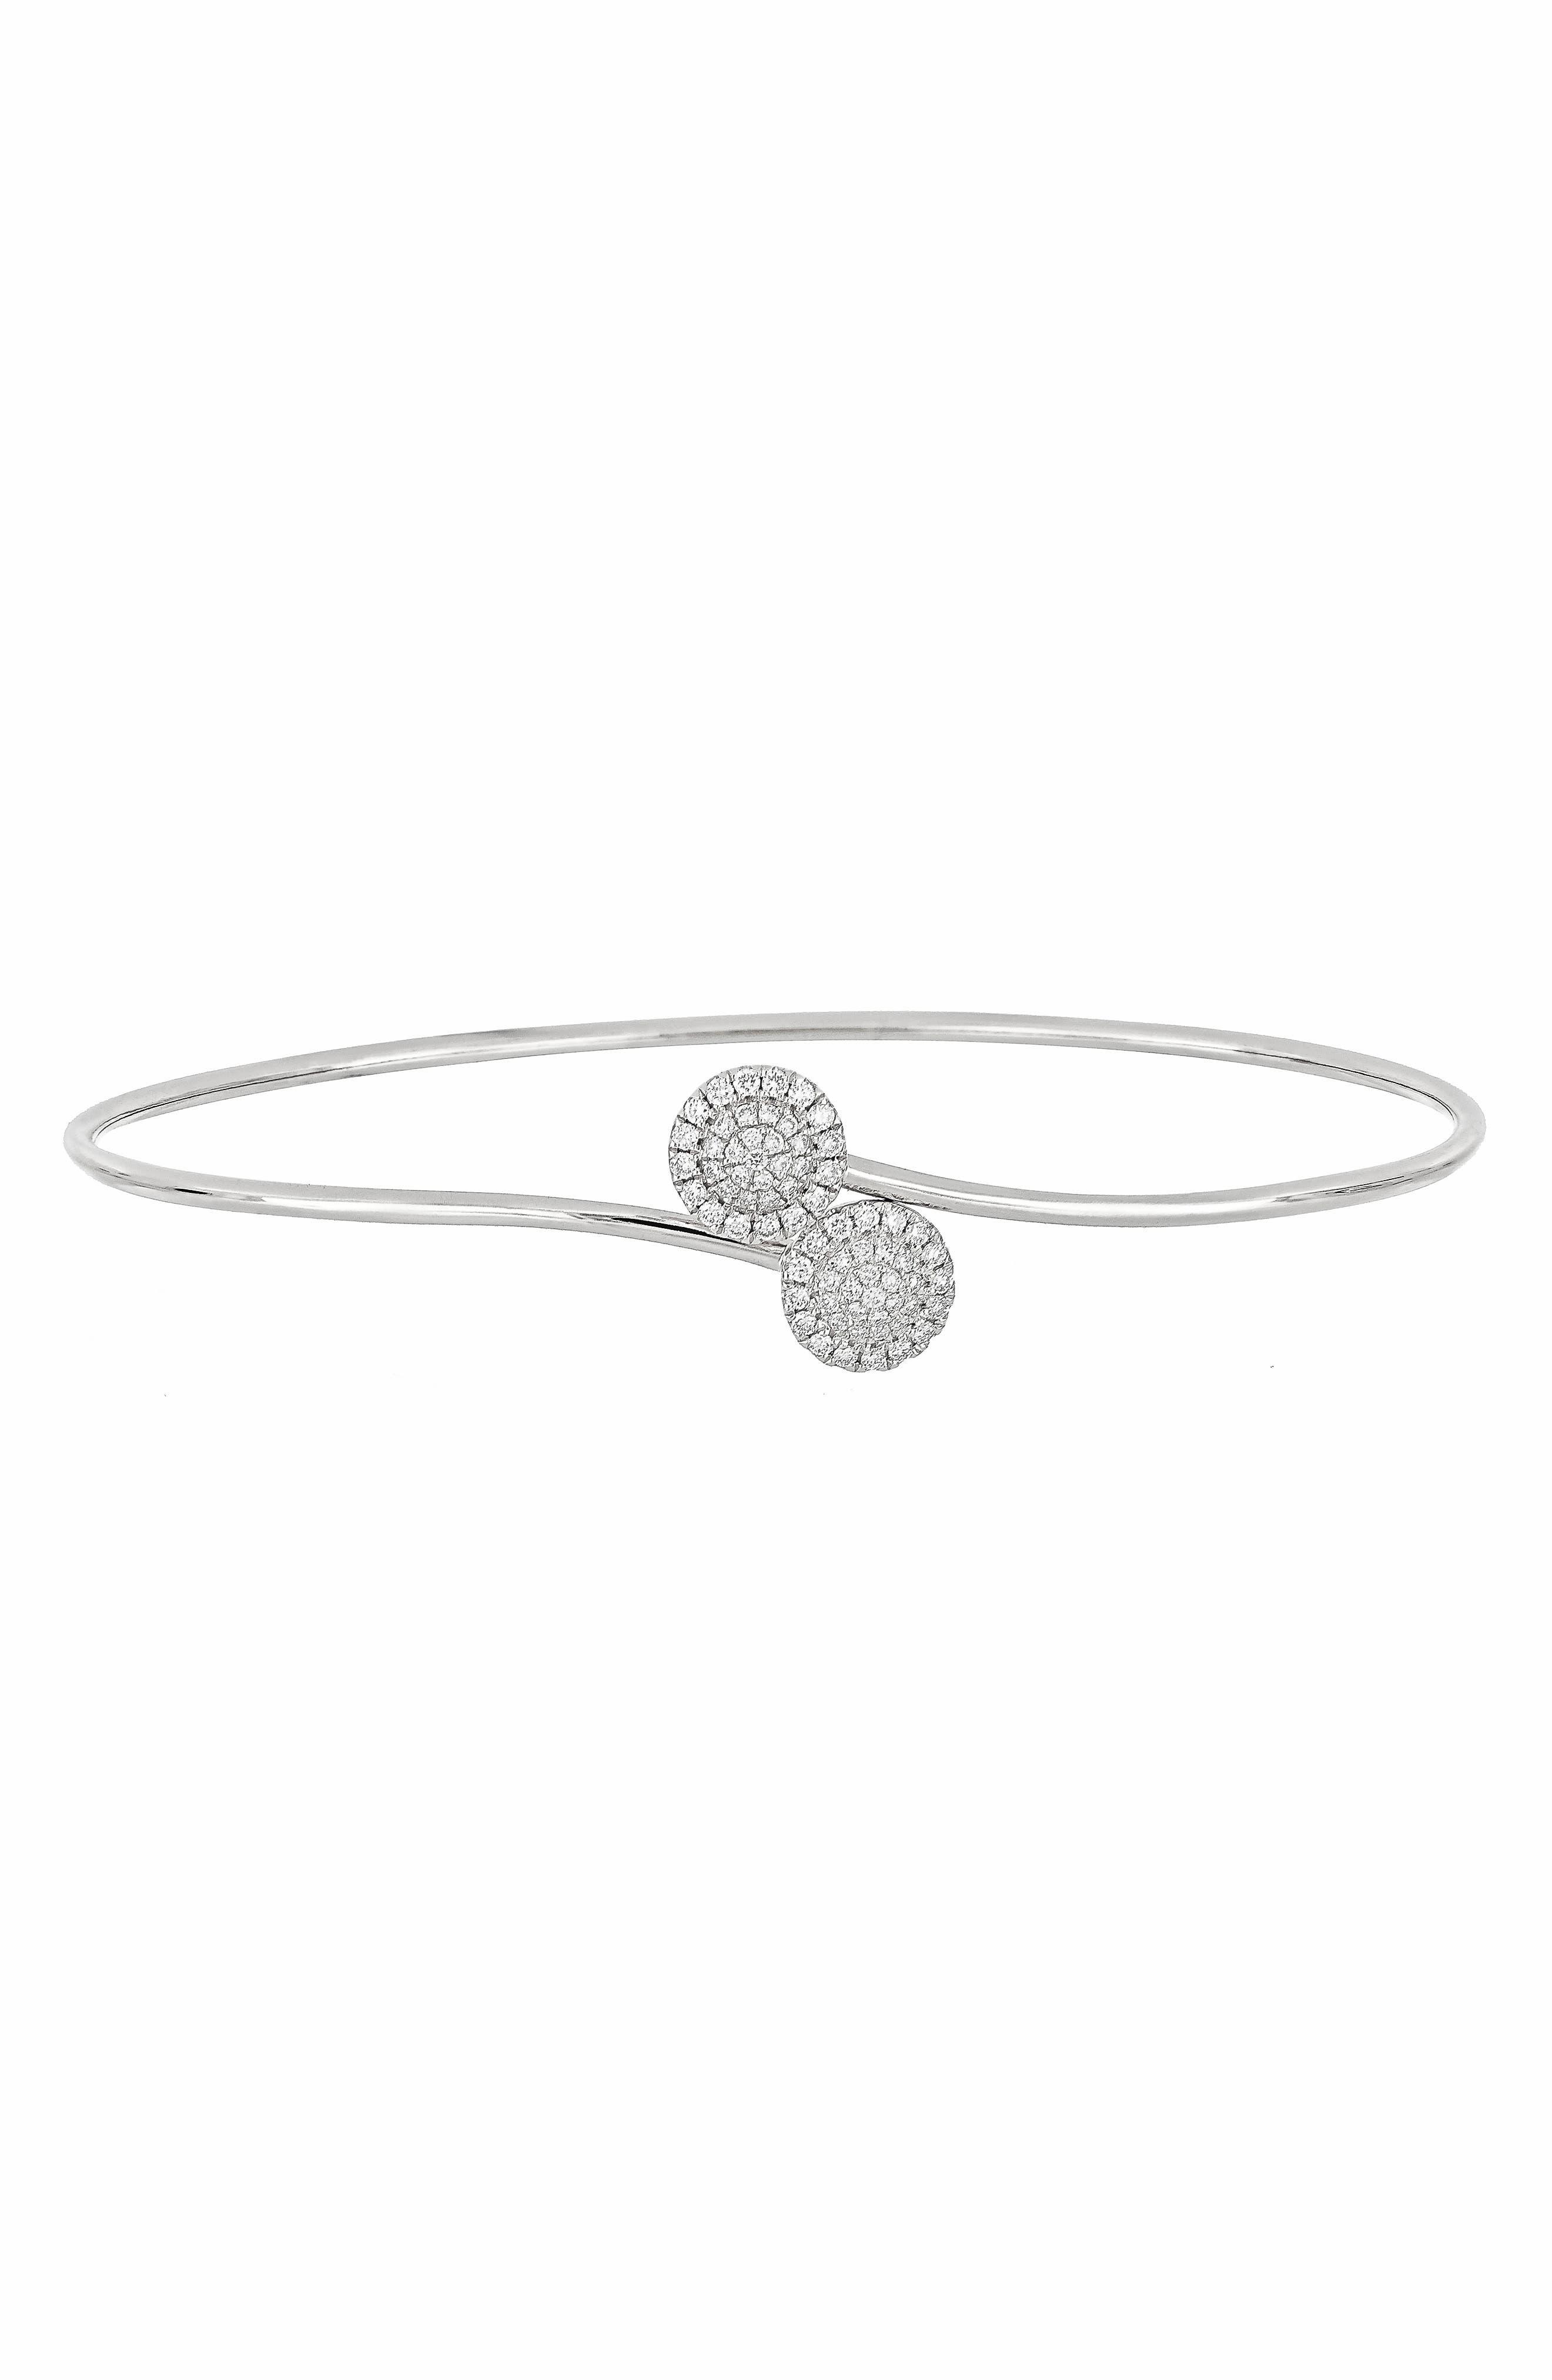 Flower Diamond Bangle,                         Main,                         color, WHITE GOLD